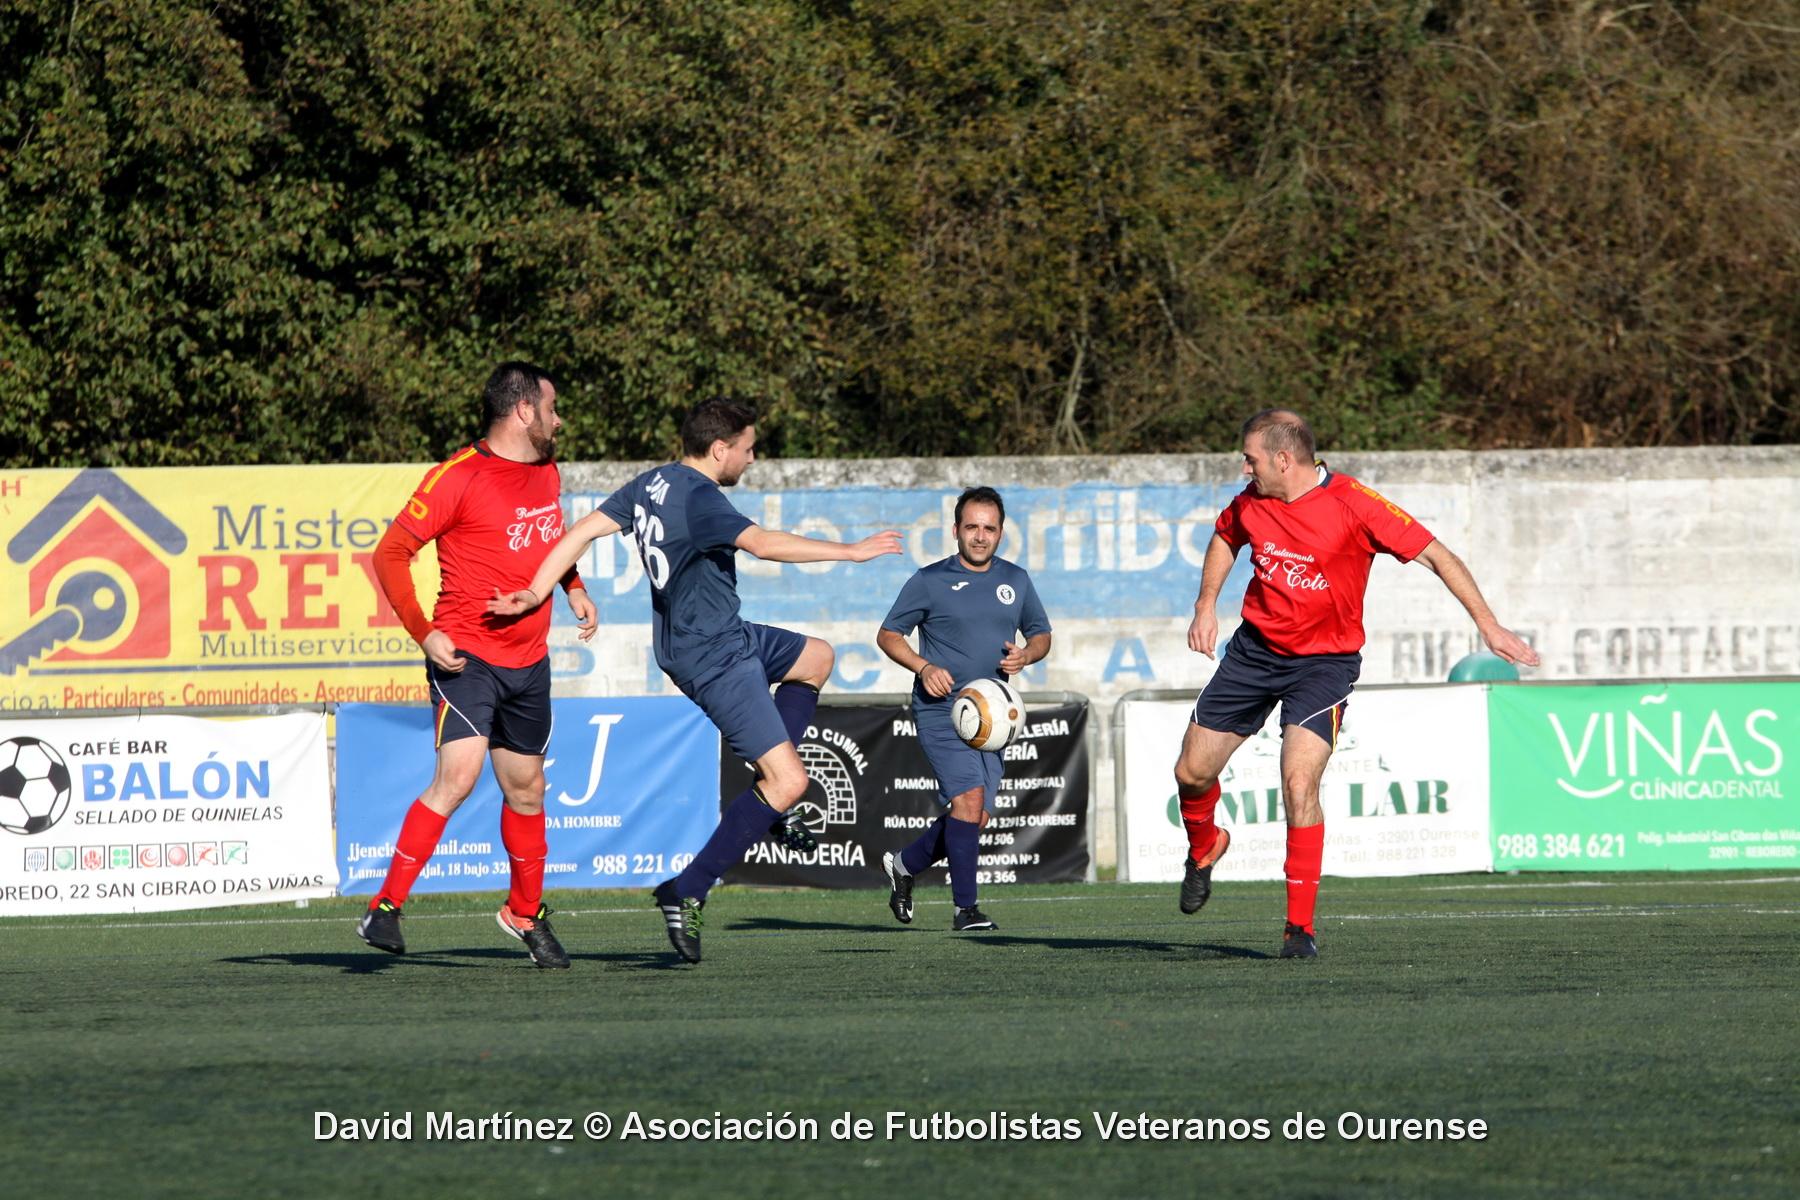 Futbol_Veteranos_Foto_DavidMartinez_35